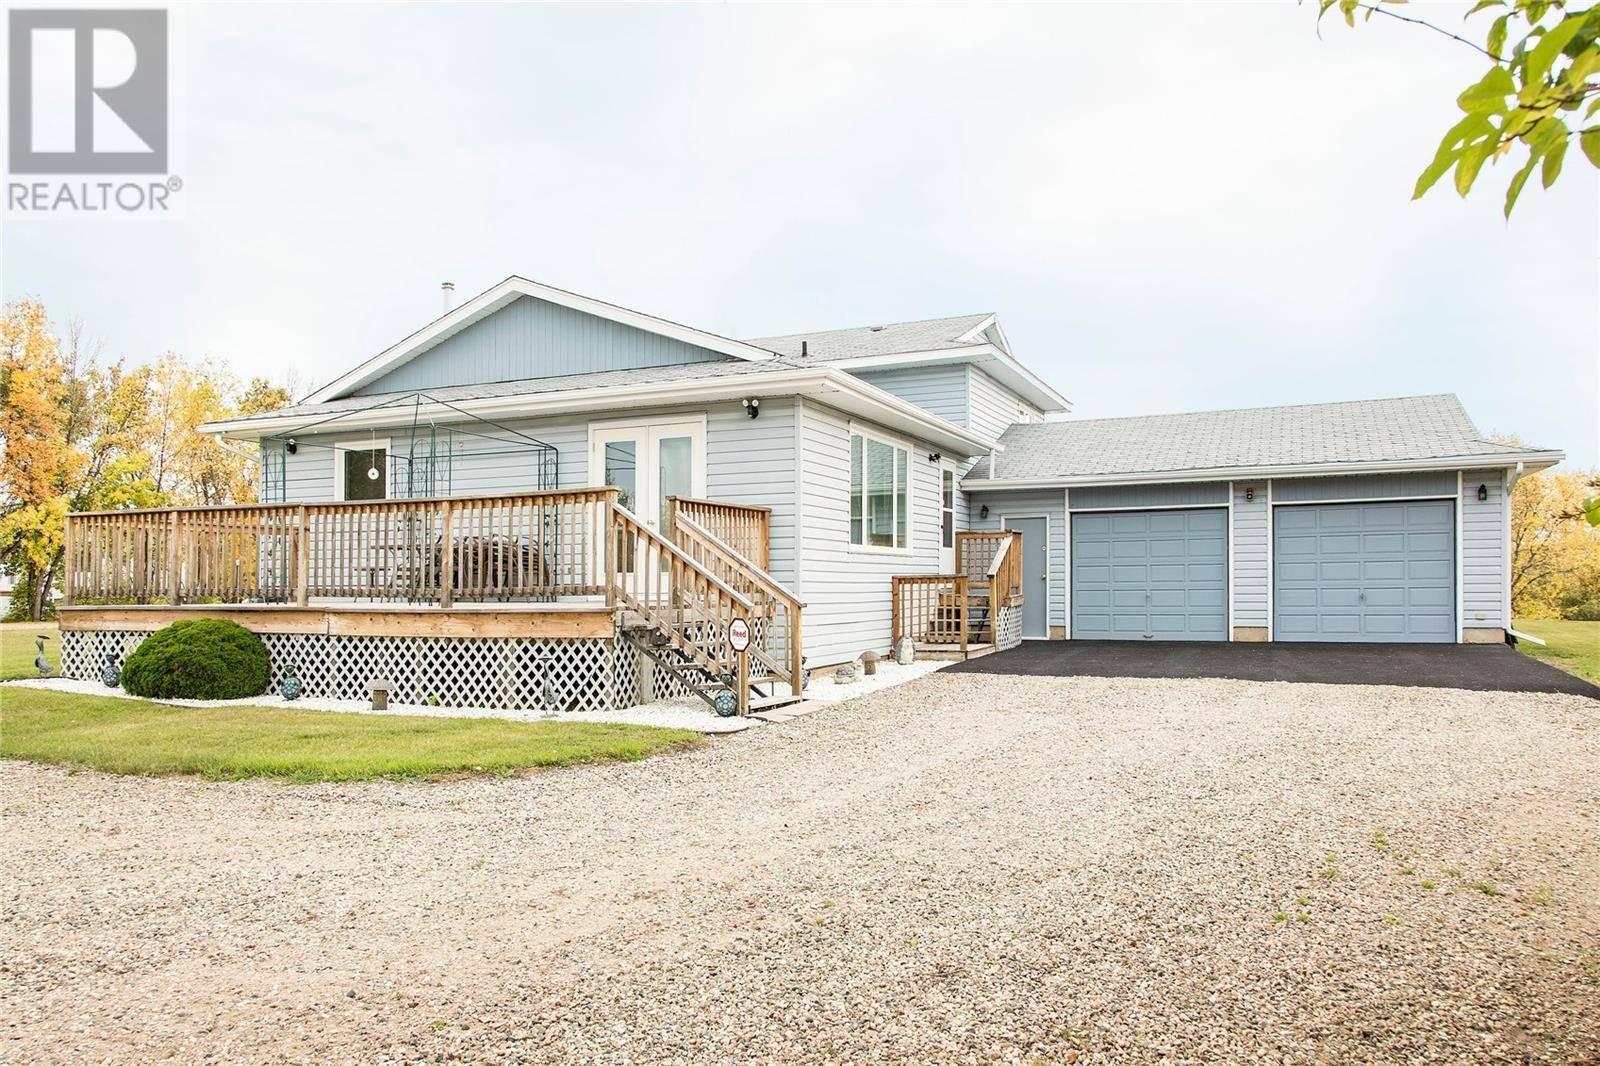 House for sale at  Macdonald Rd Prince Albert Rm No. 461 Saskatchewan - MLS: SK804739